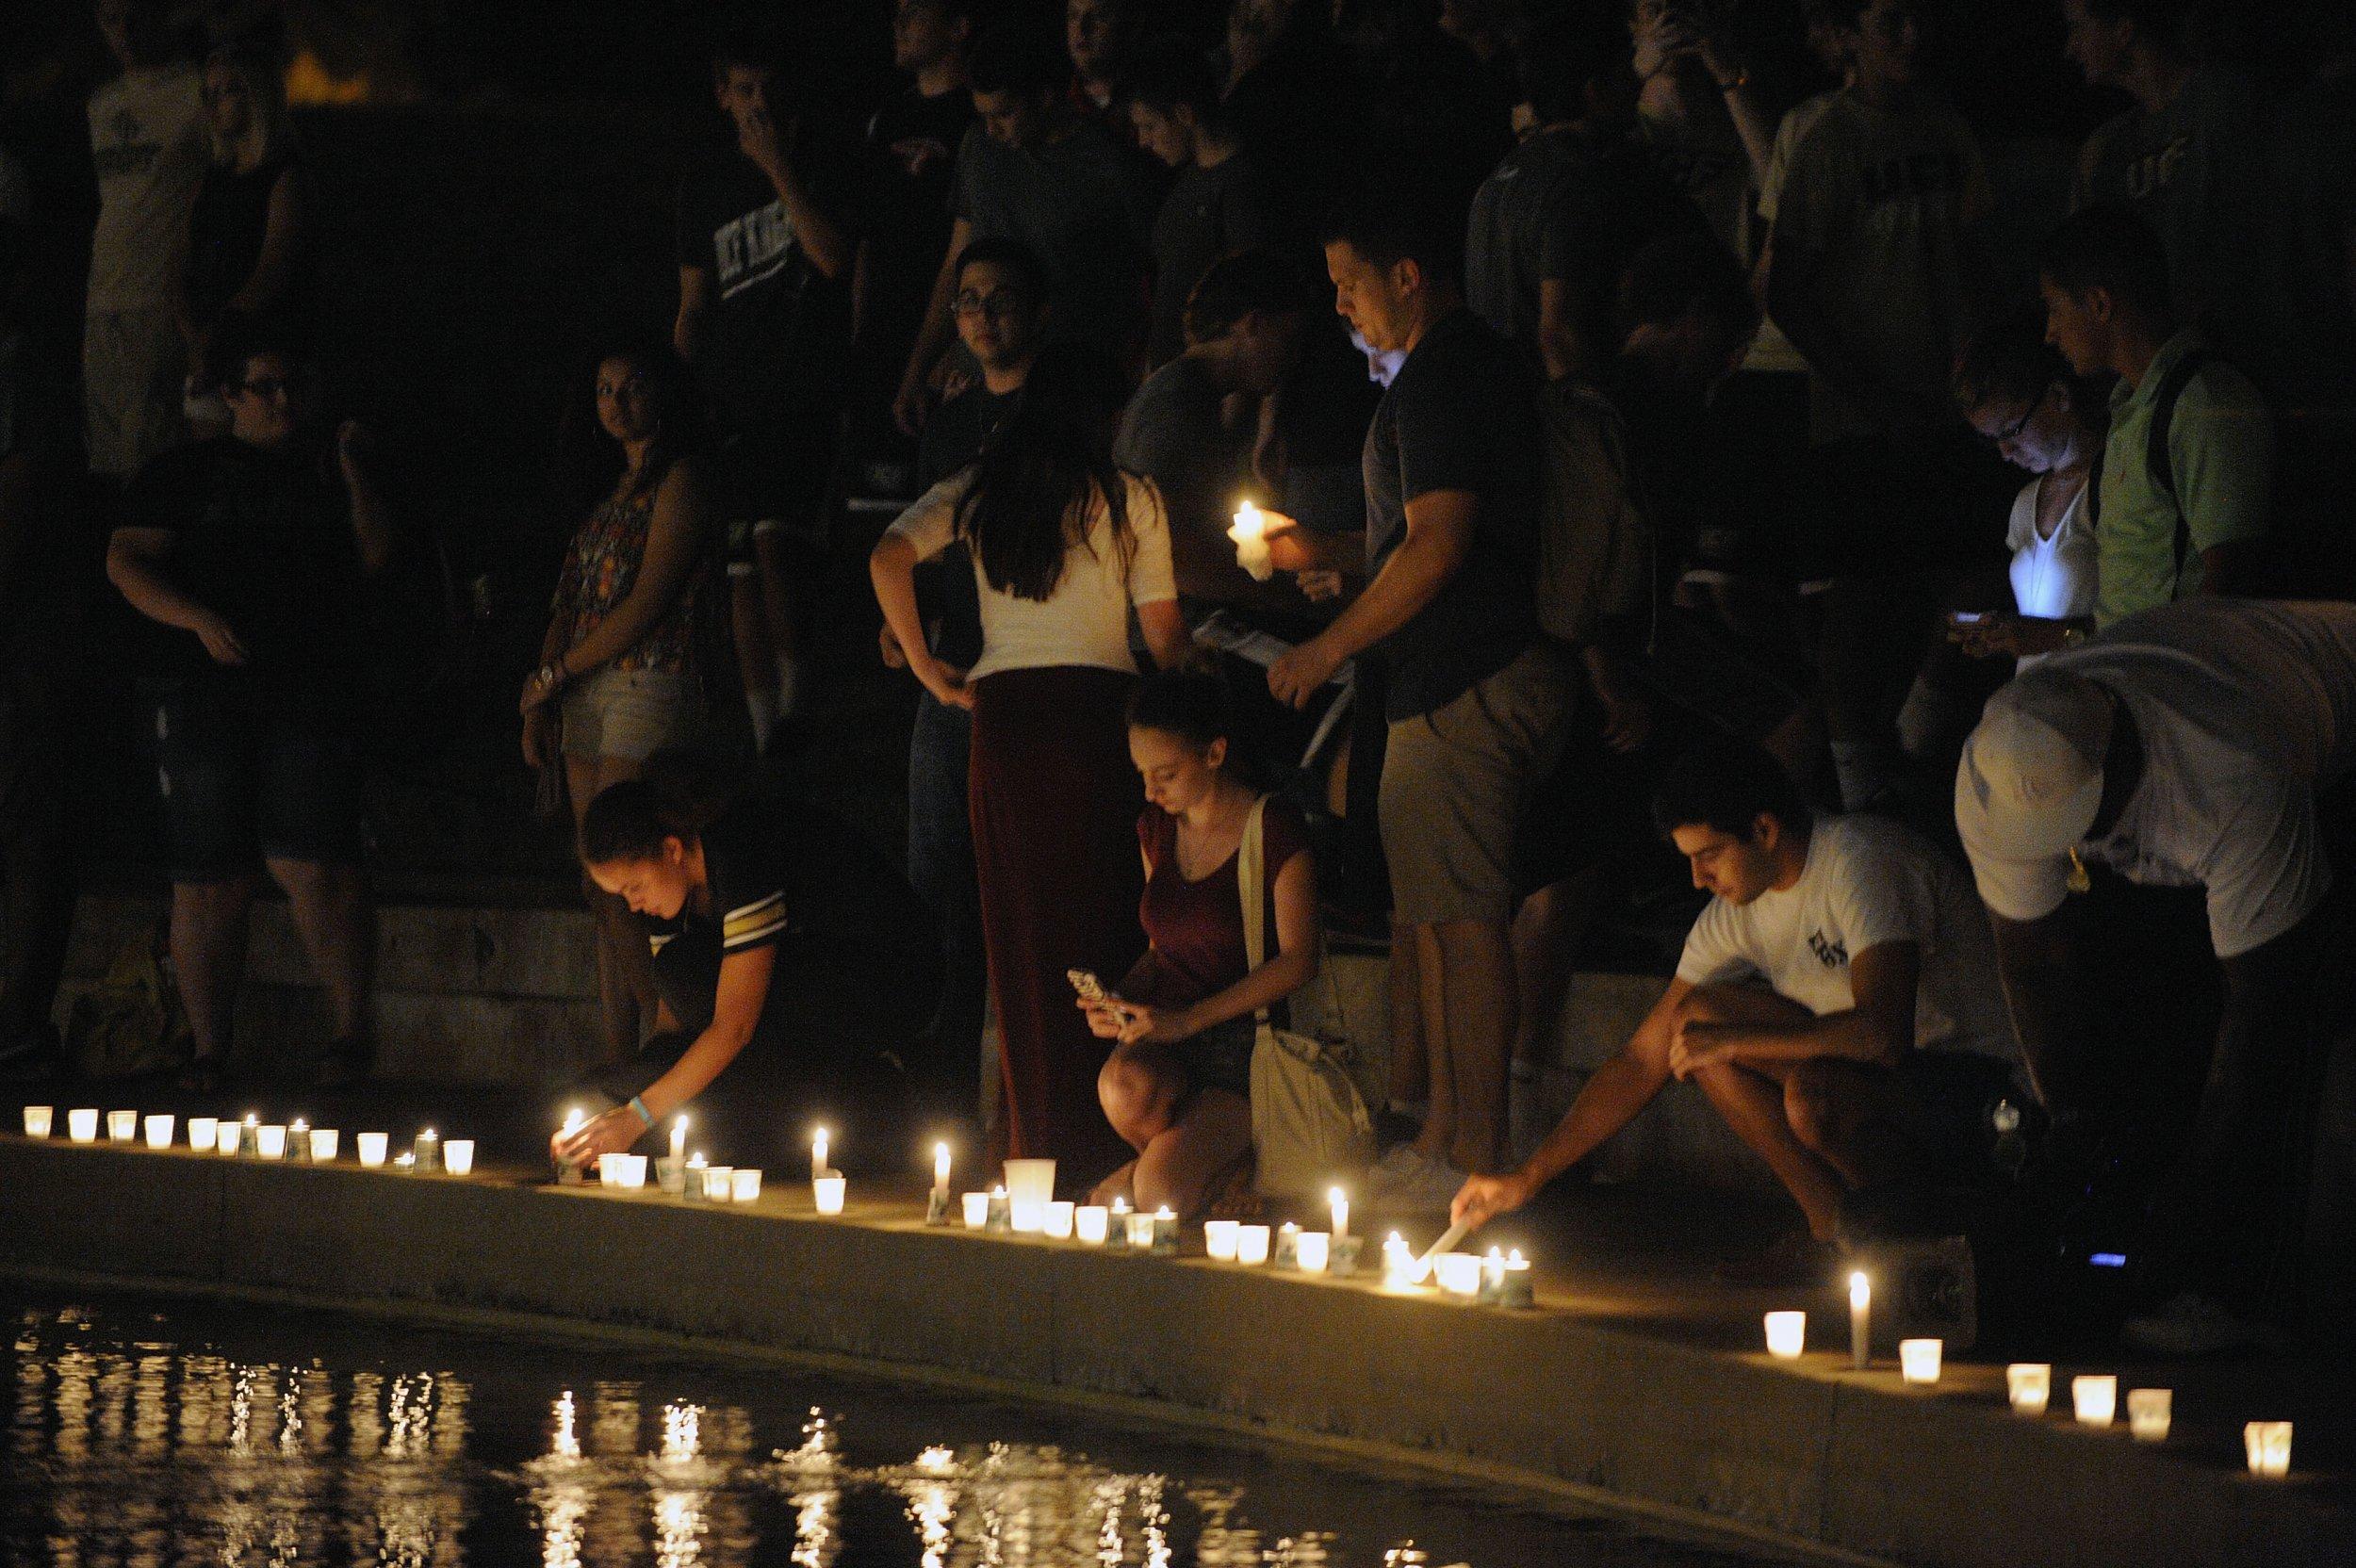 12-15-14 Sotloff vigil